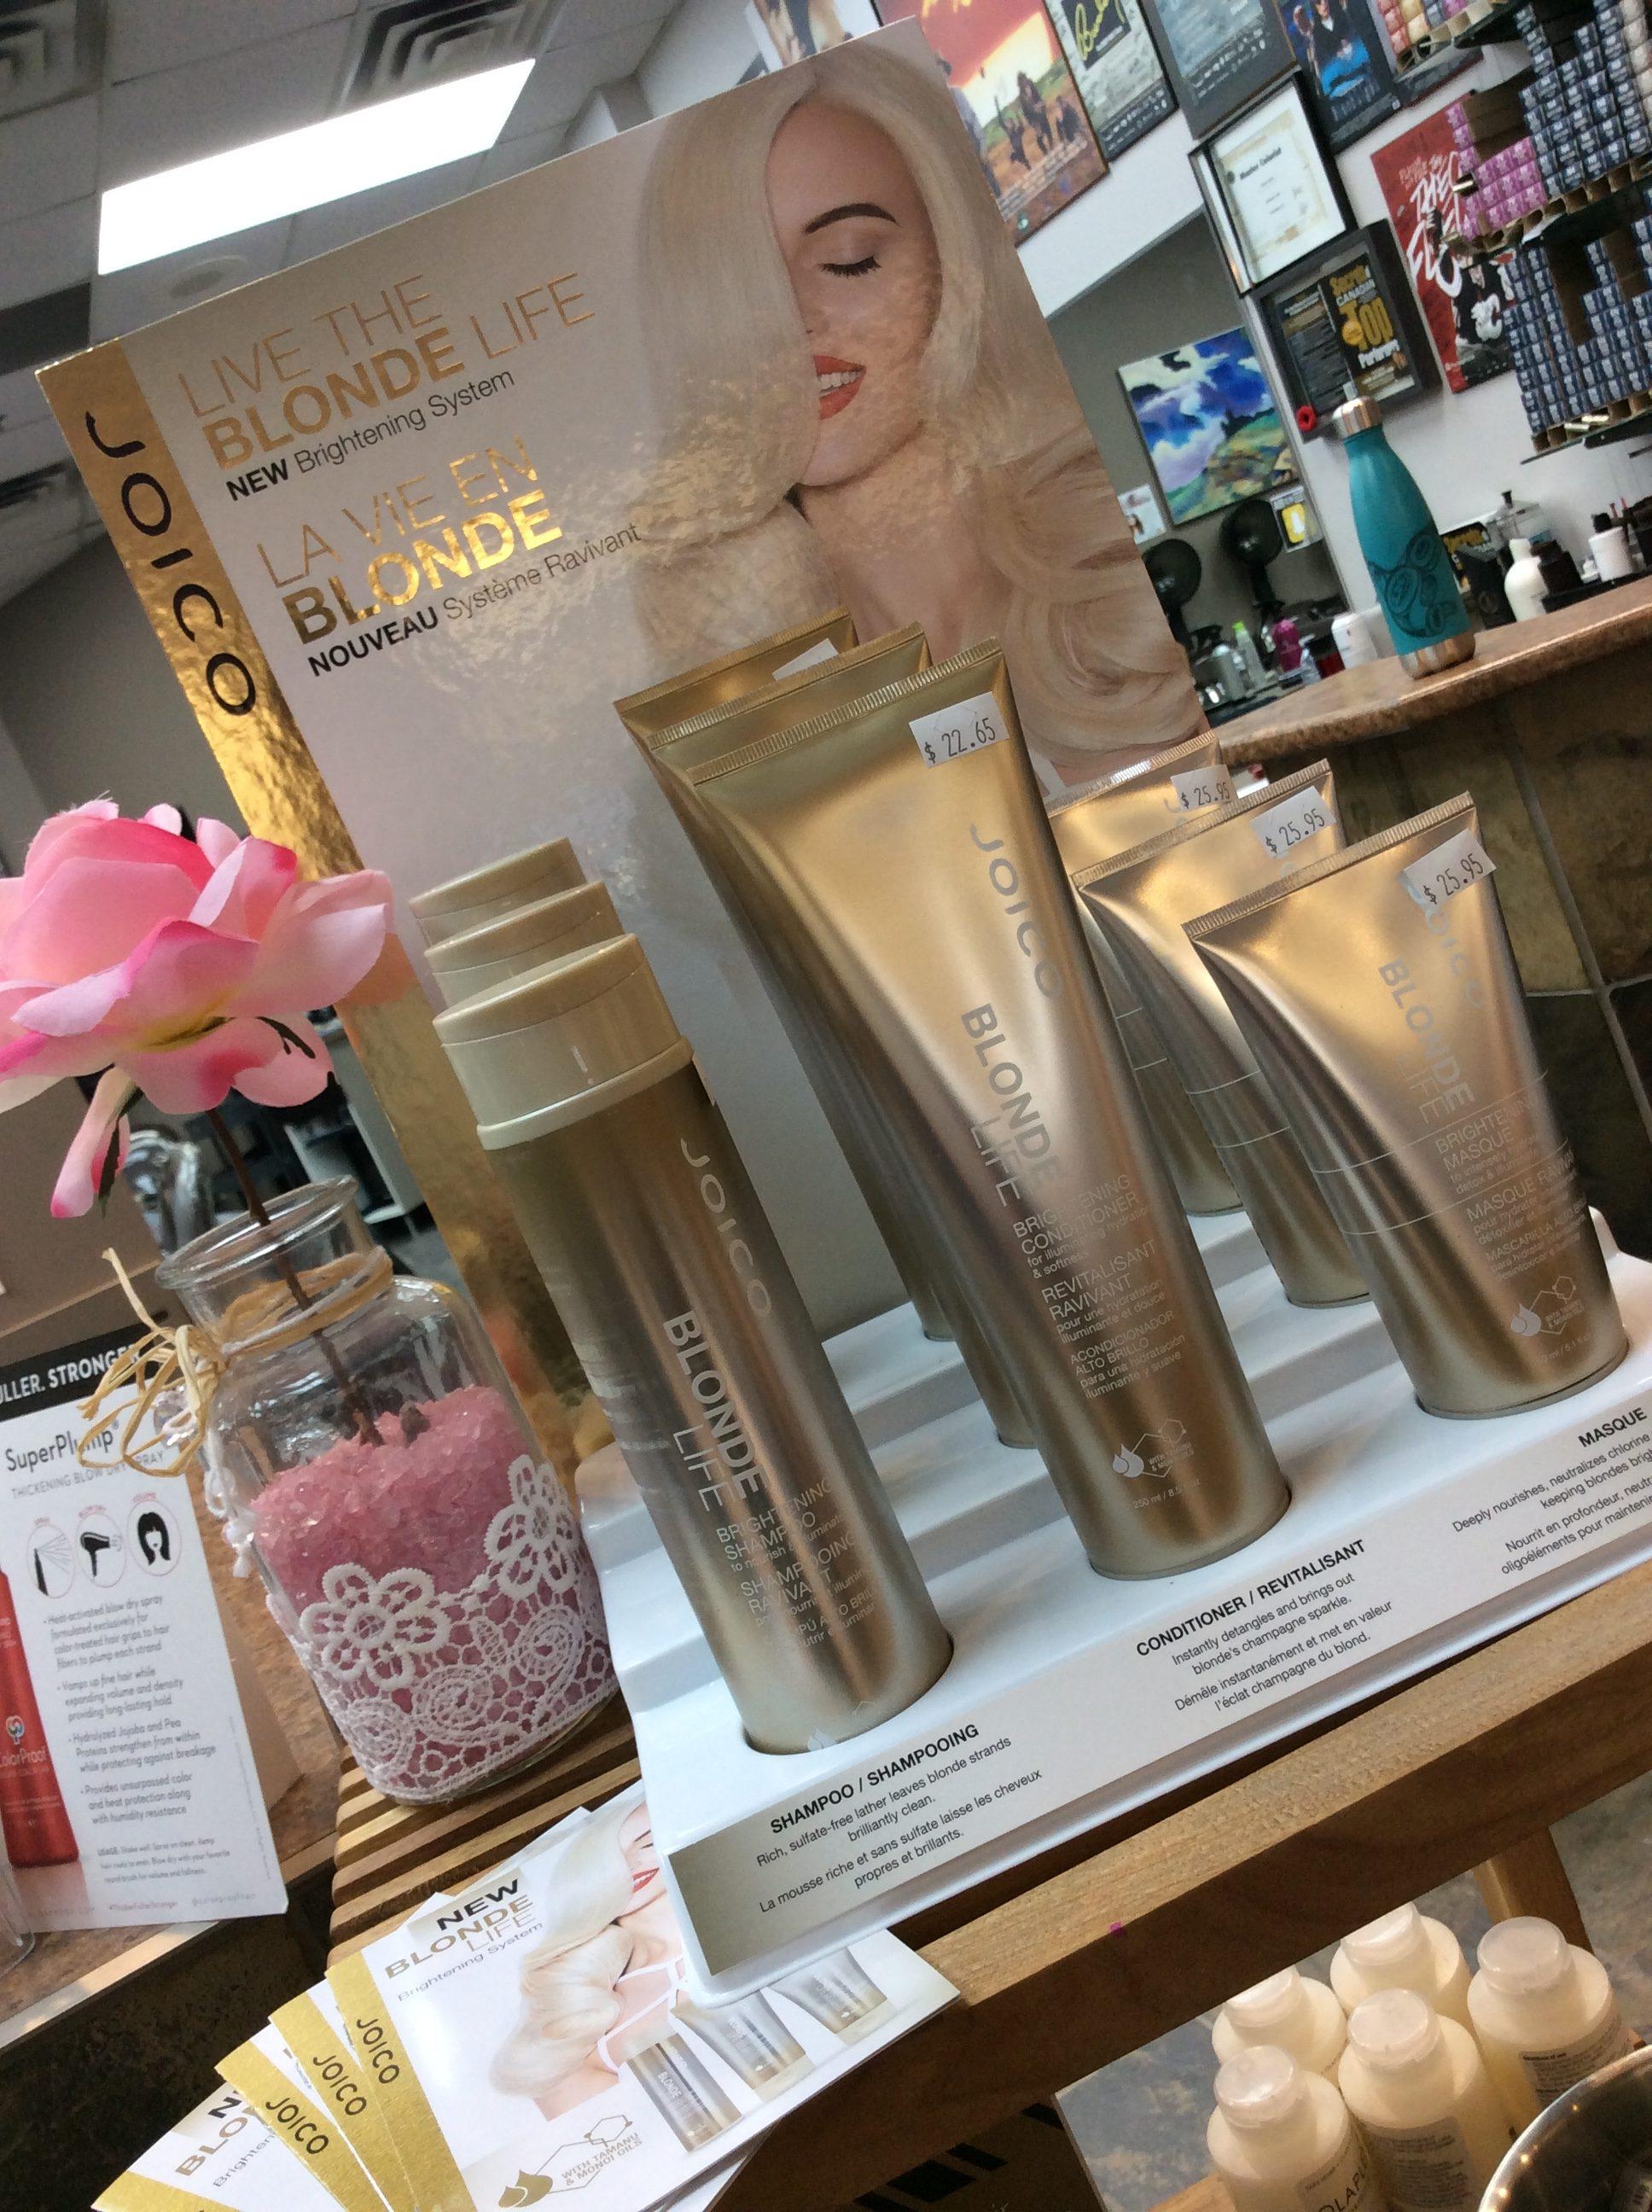 Blonde hair products displayed at hairstyle inn Saskatoon